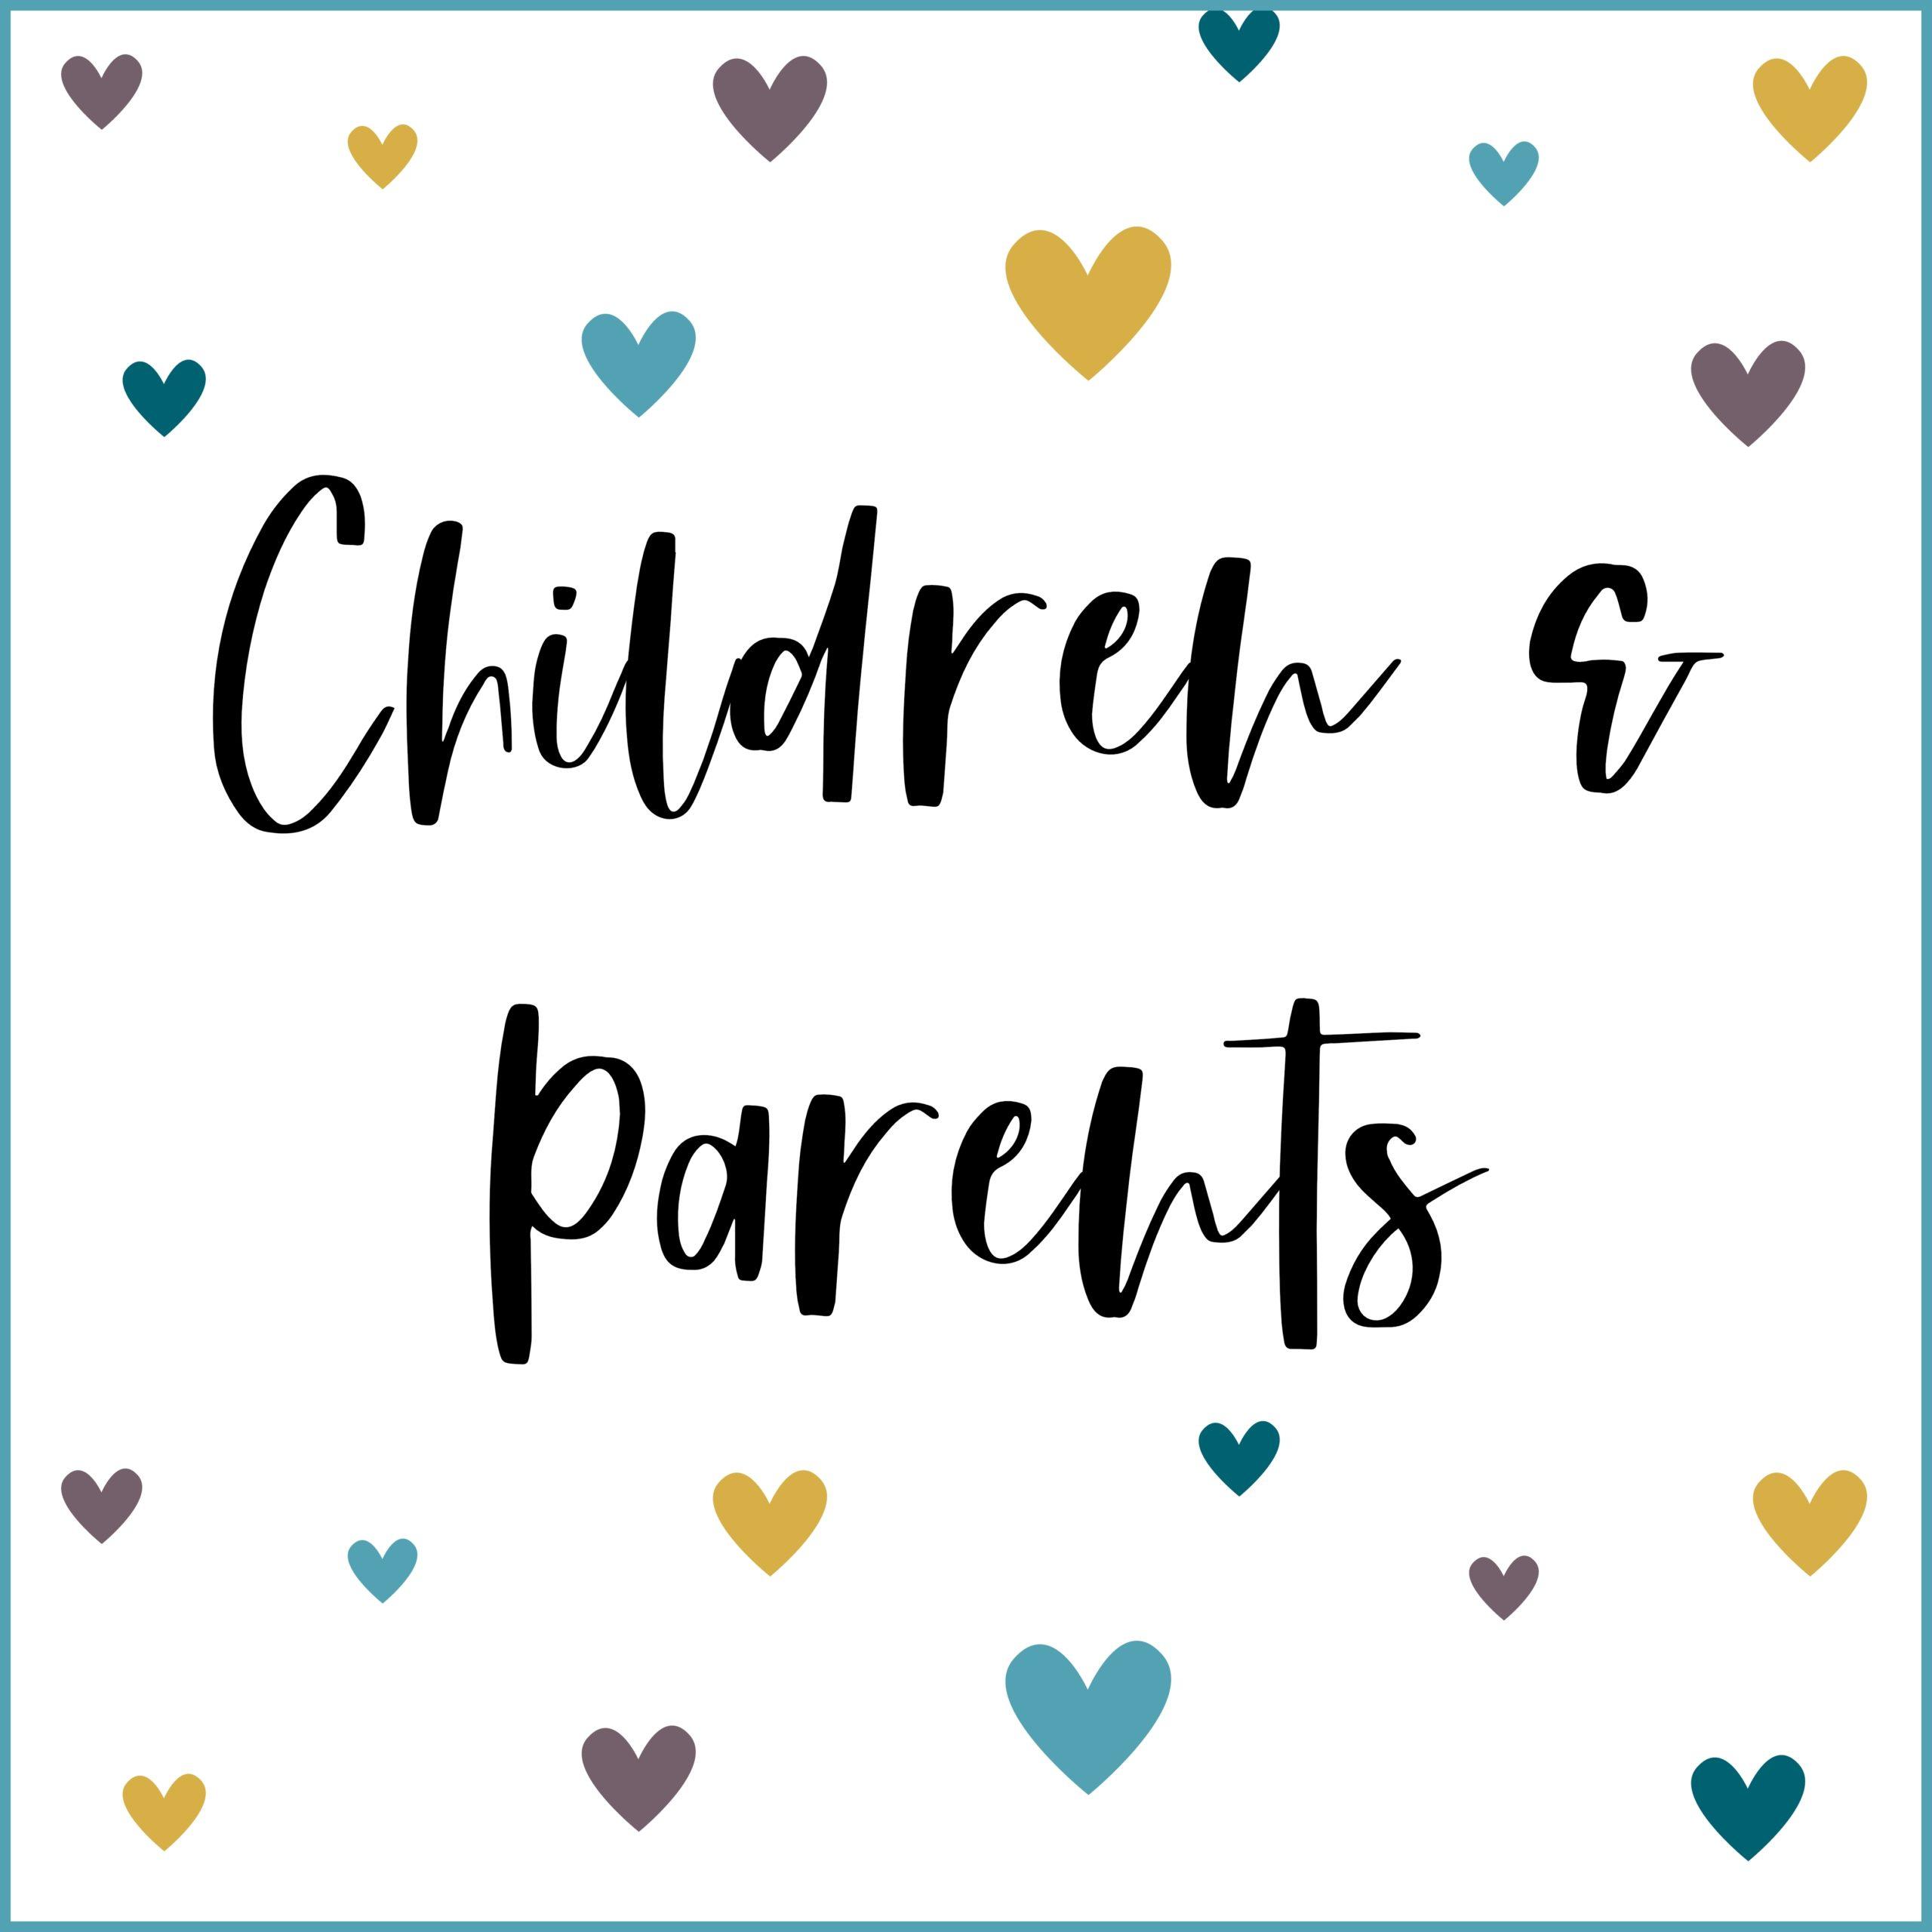 Children & Parents